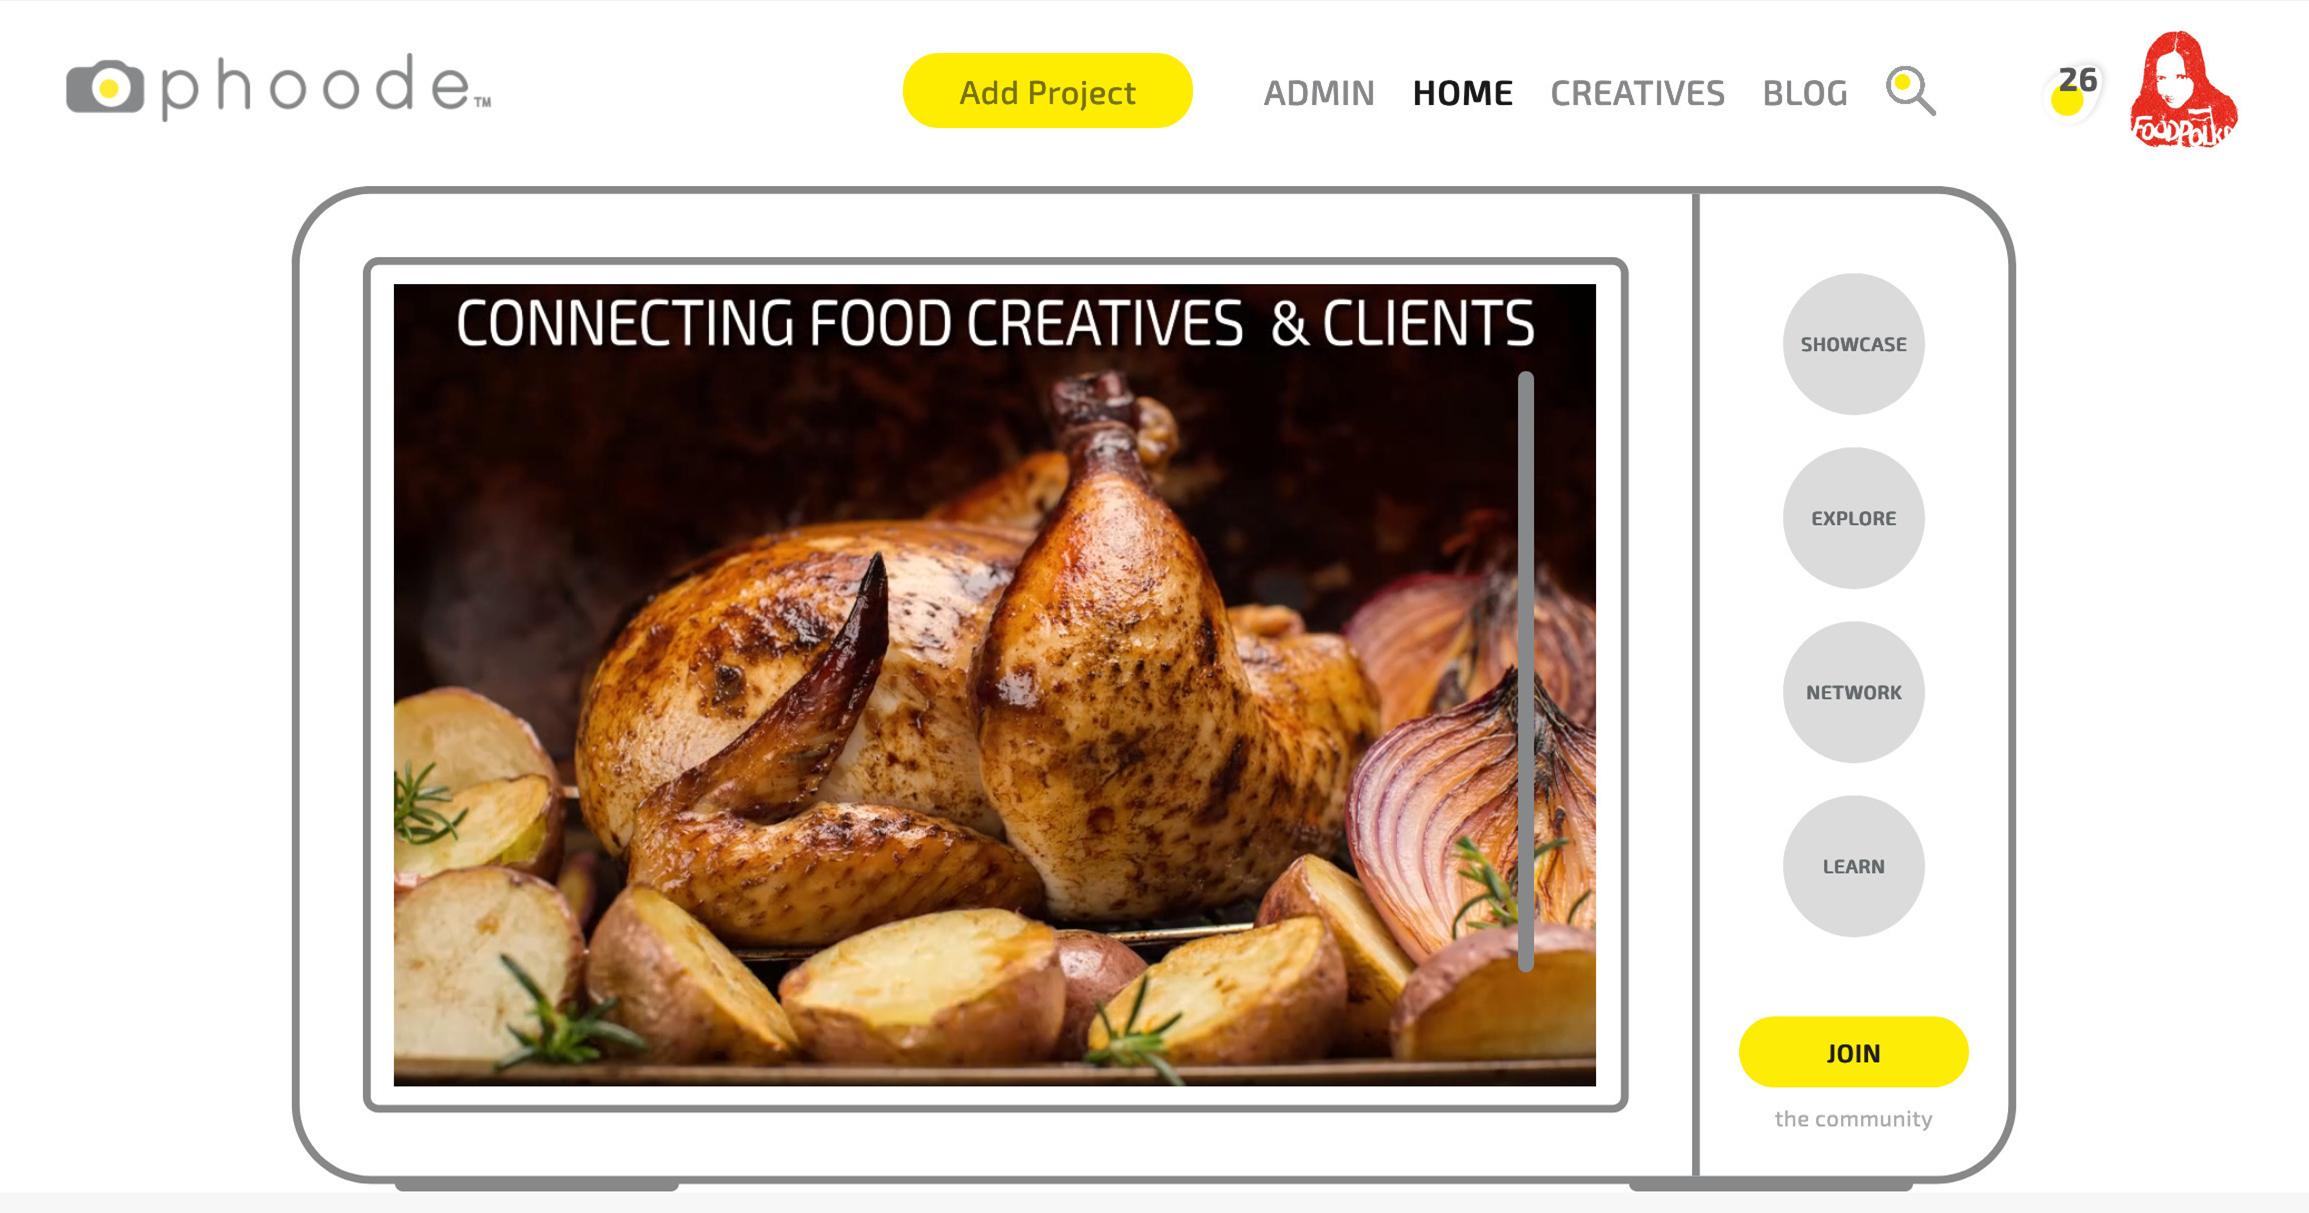 phoode, food marketing ideas, food photographers directory, food stylist directory, social network for food marketers, social network for food creatives, food advertising network, food branding network, Discover hire food photographers food stylists